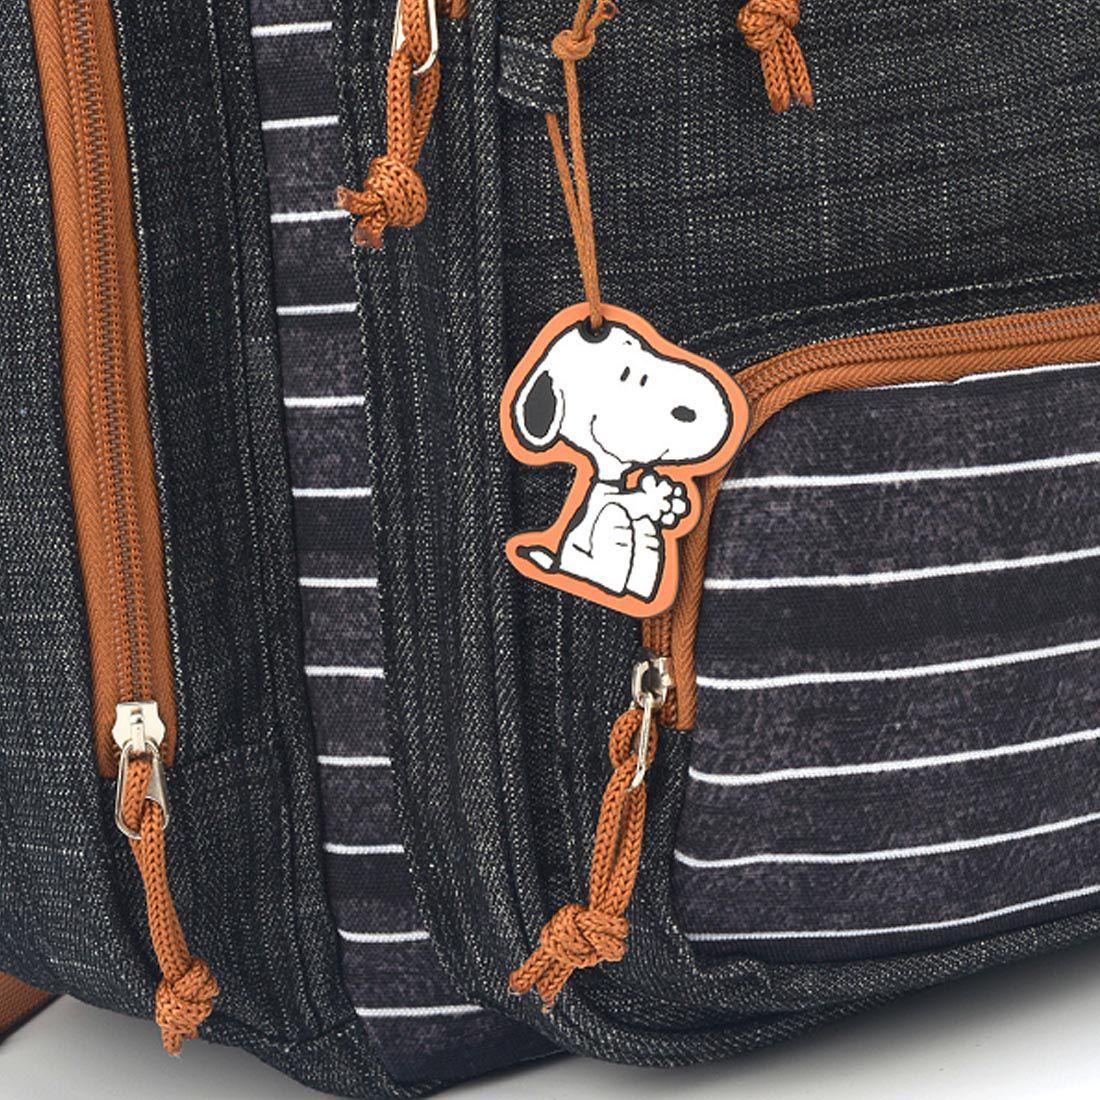 Mochila para Notebook Feminina Snoopy com Estojo MJ48518SN-PT